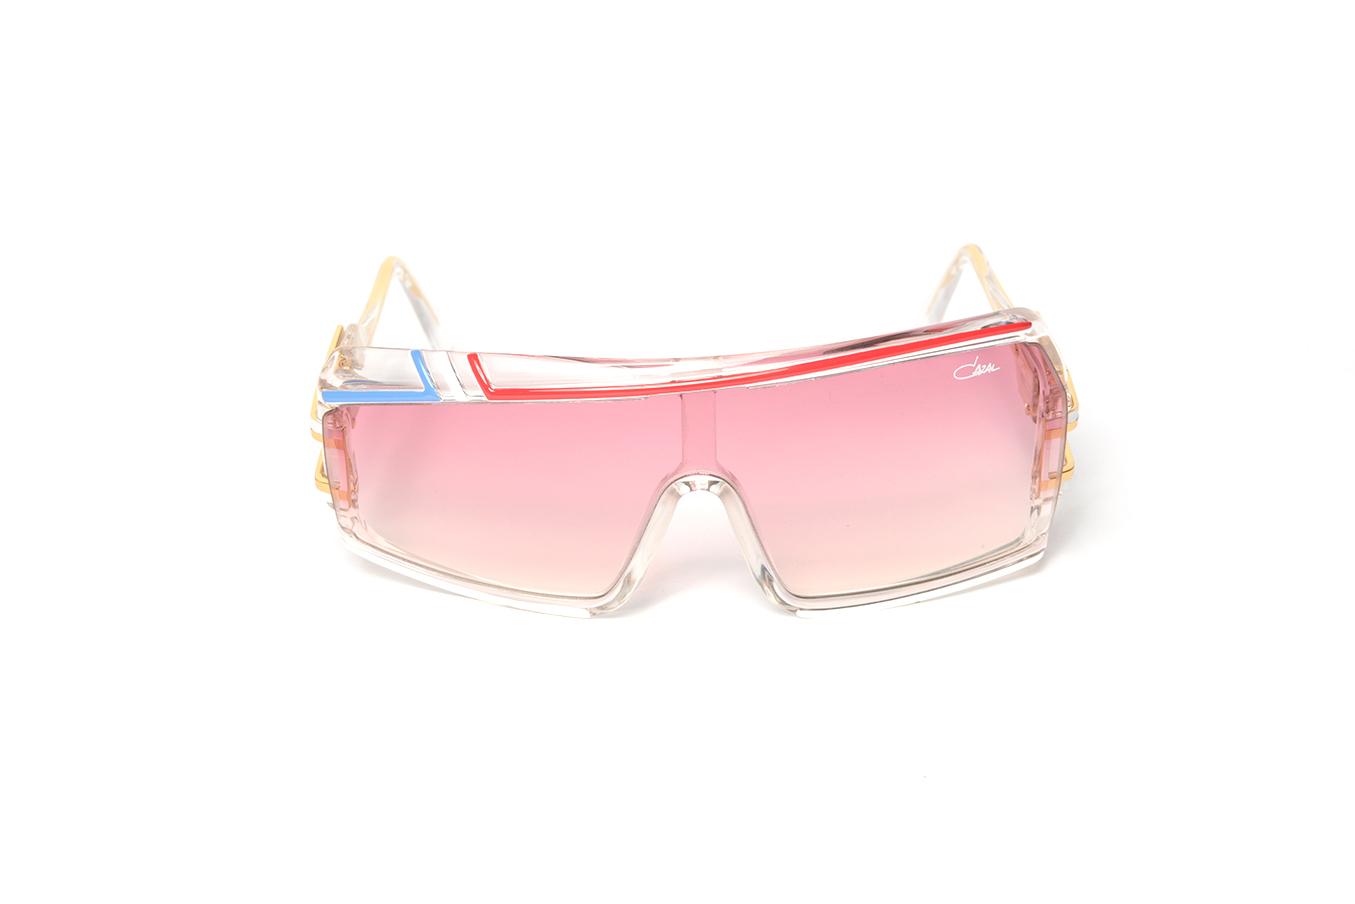 ee8829b340 Cazal Eyewear 858 - Piccadilly Opticians